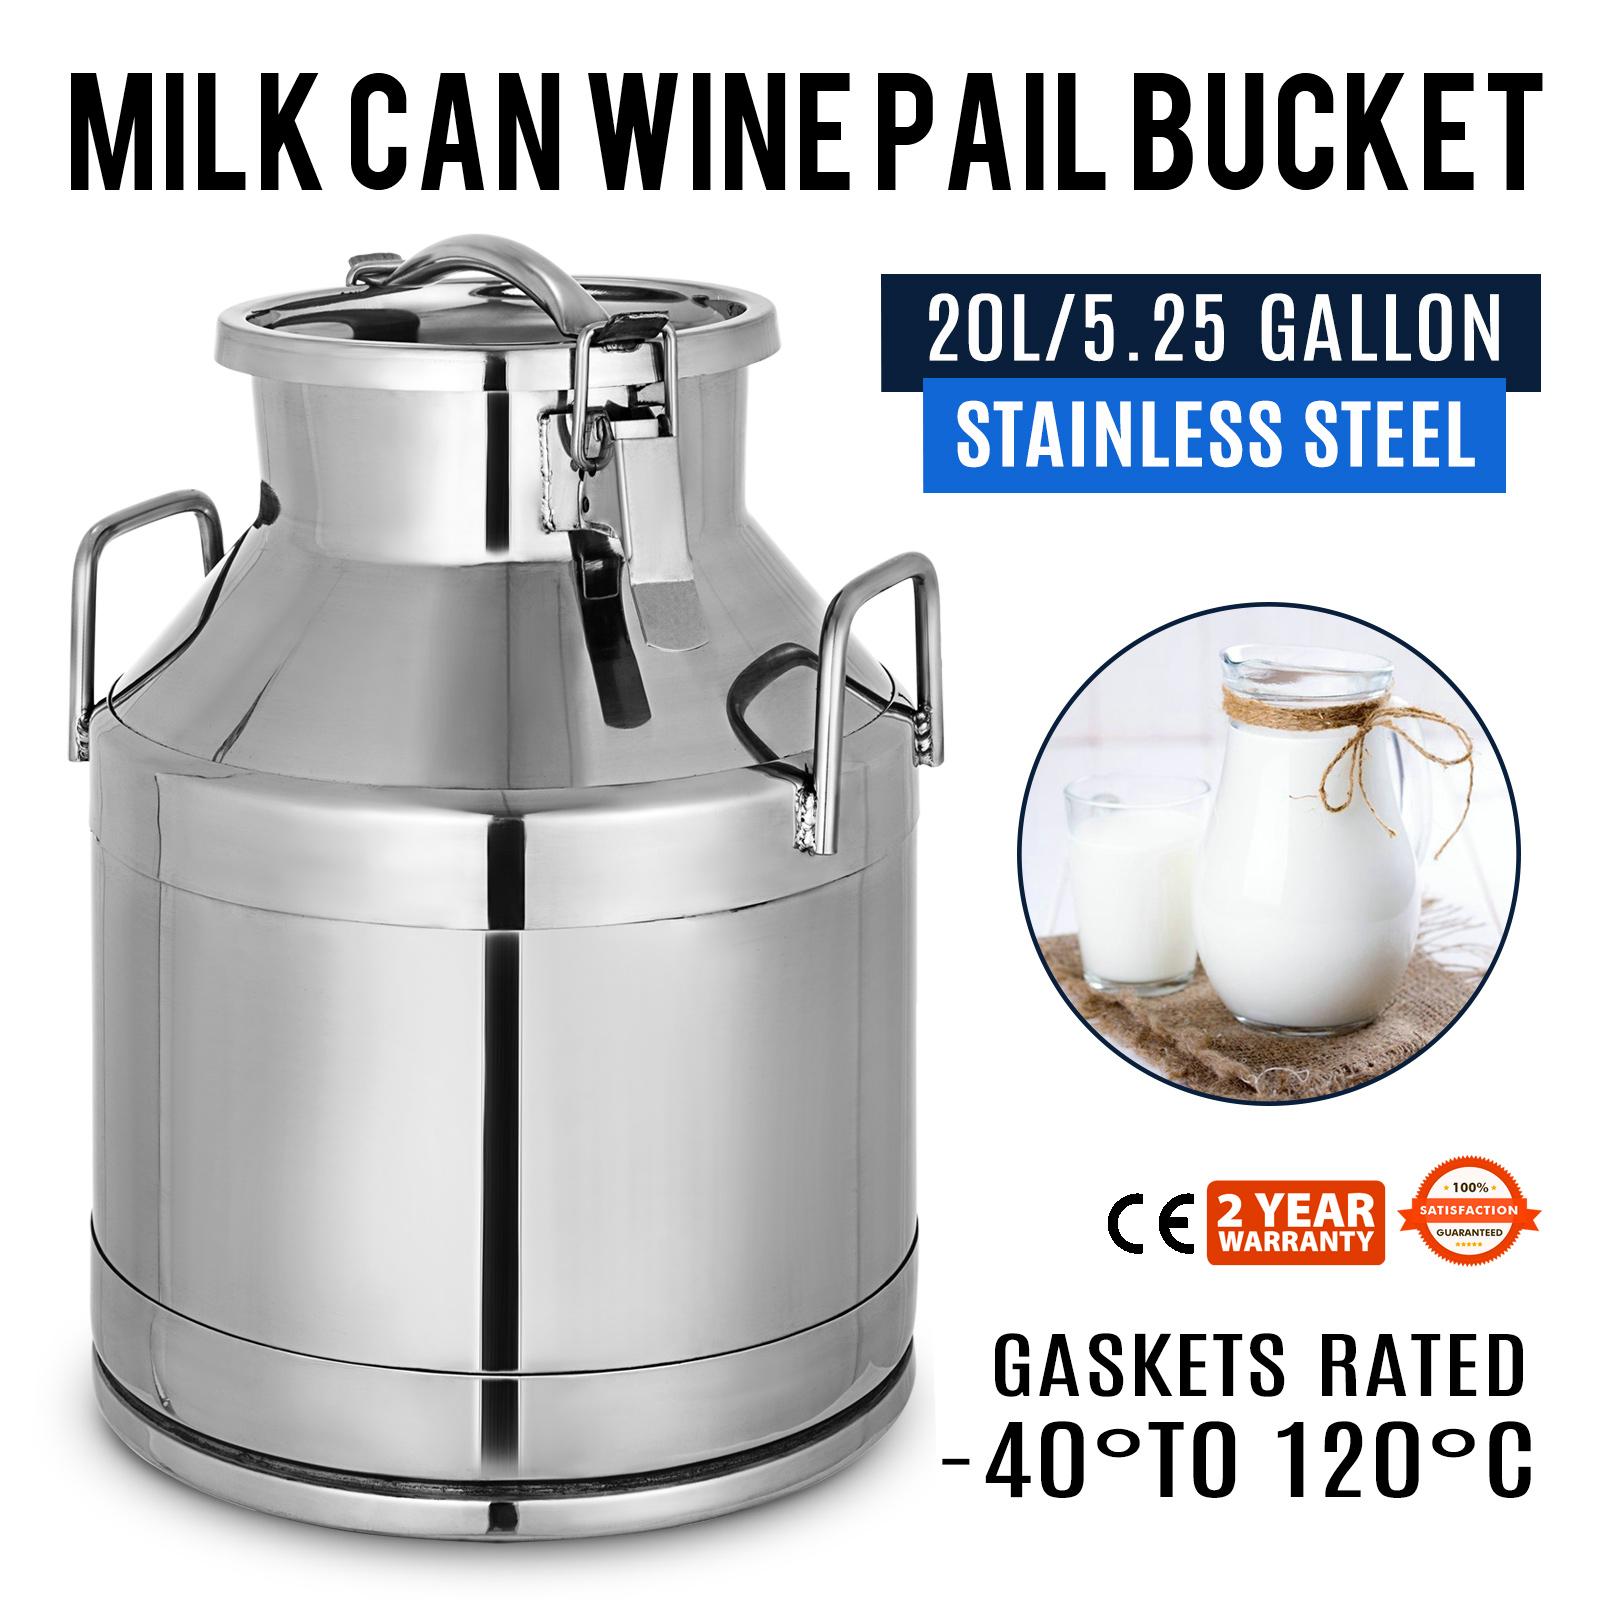 20 Liter Stainless Steel Can Milk Canister /Milk POT Bucket Gallon Milker-w/Lid